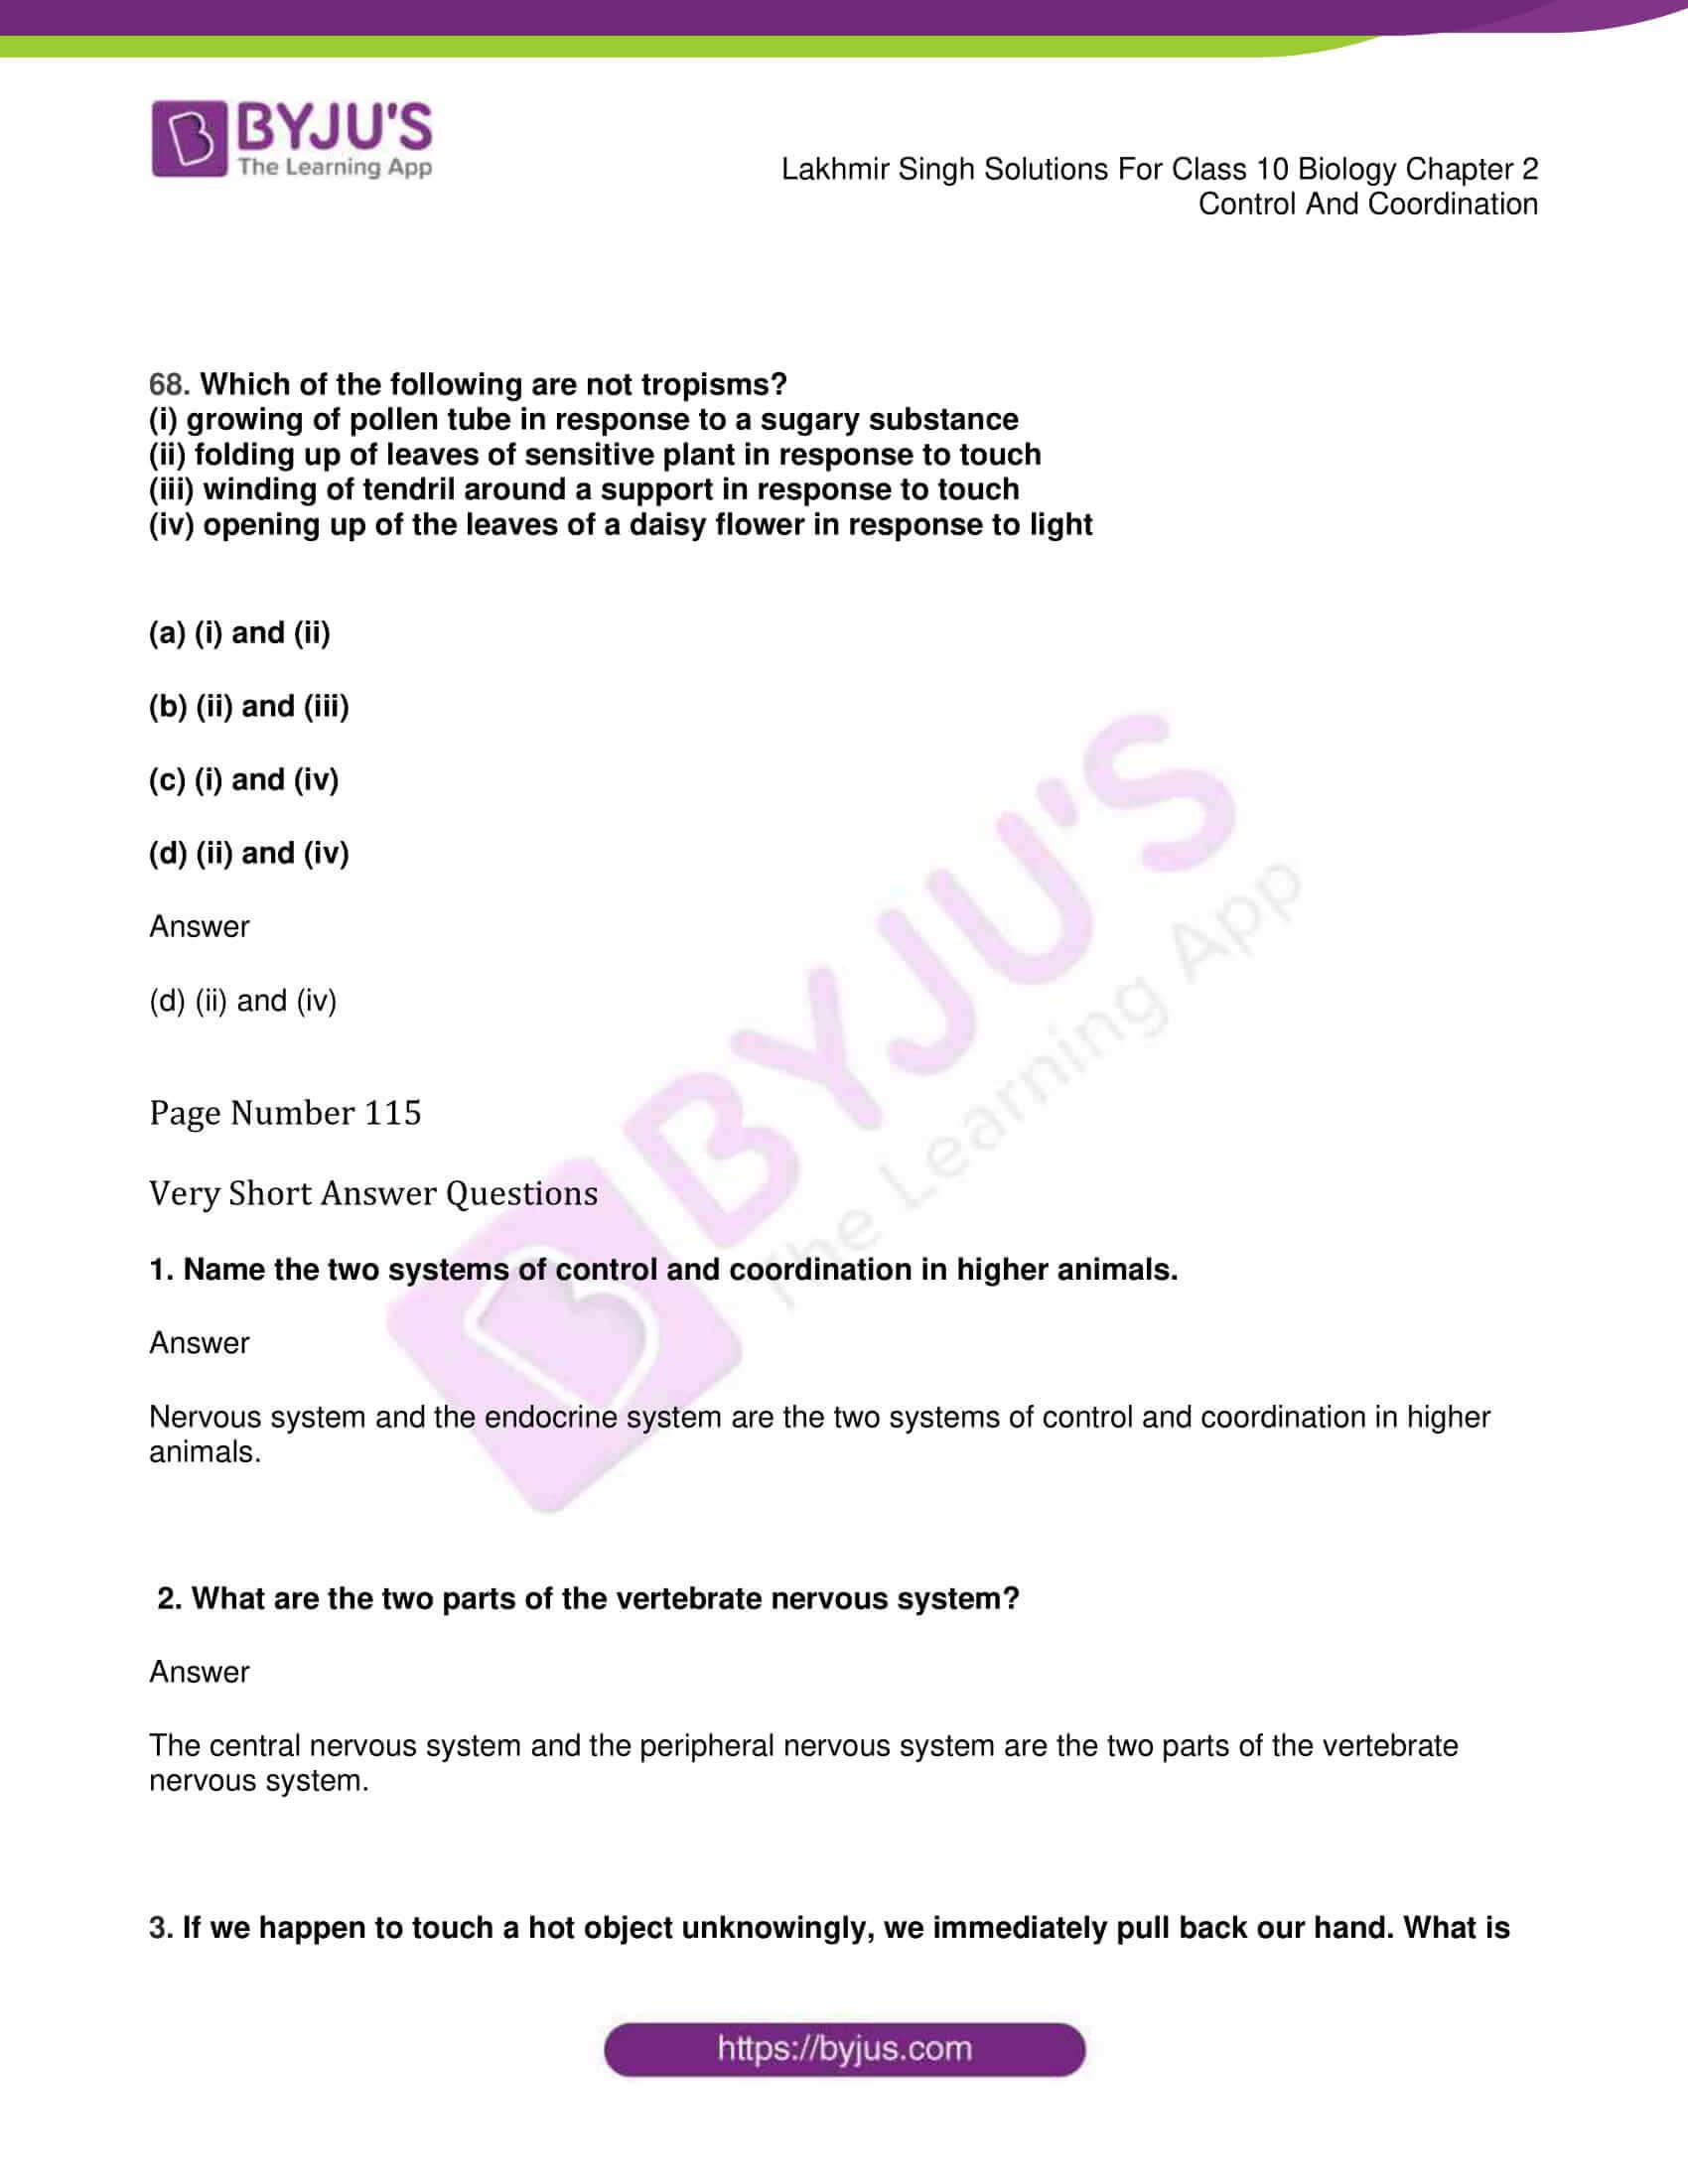 lakhmir singh sol class 10 biology chapter 2 22